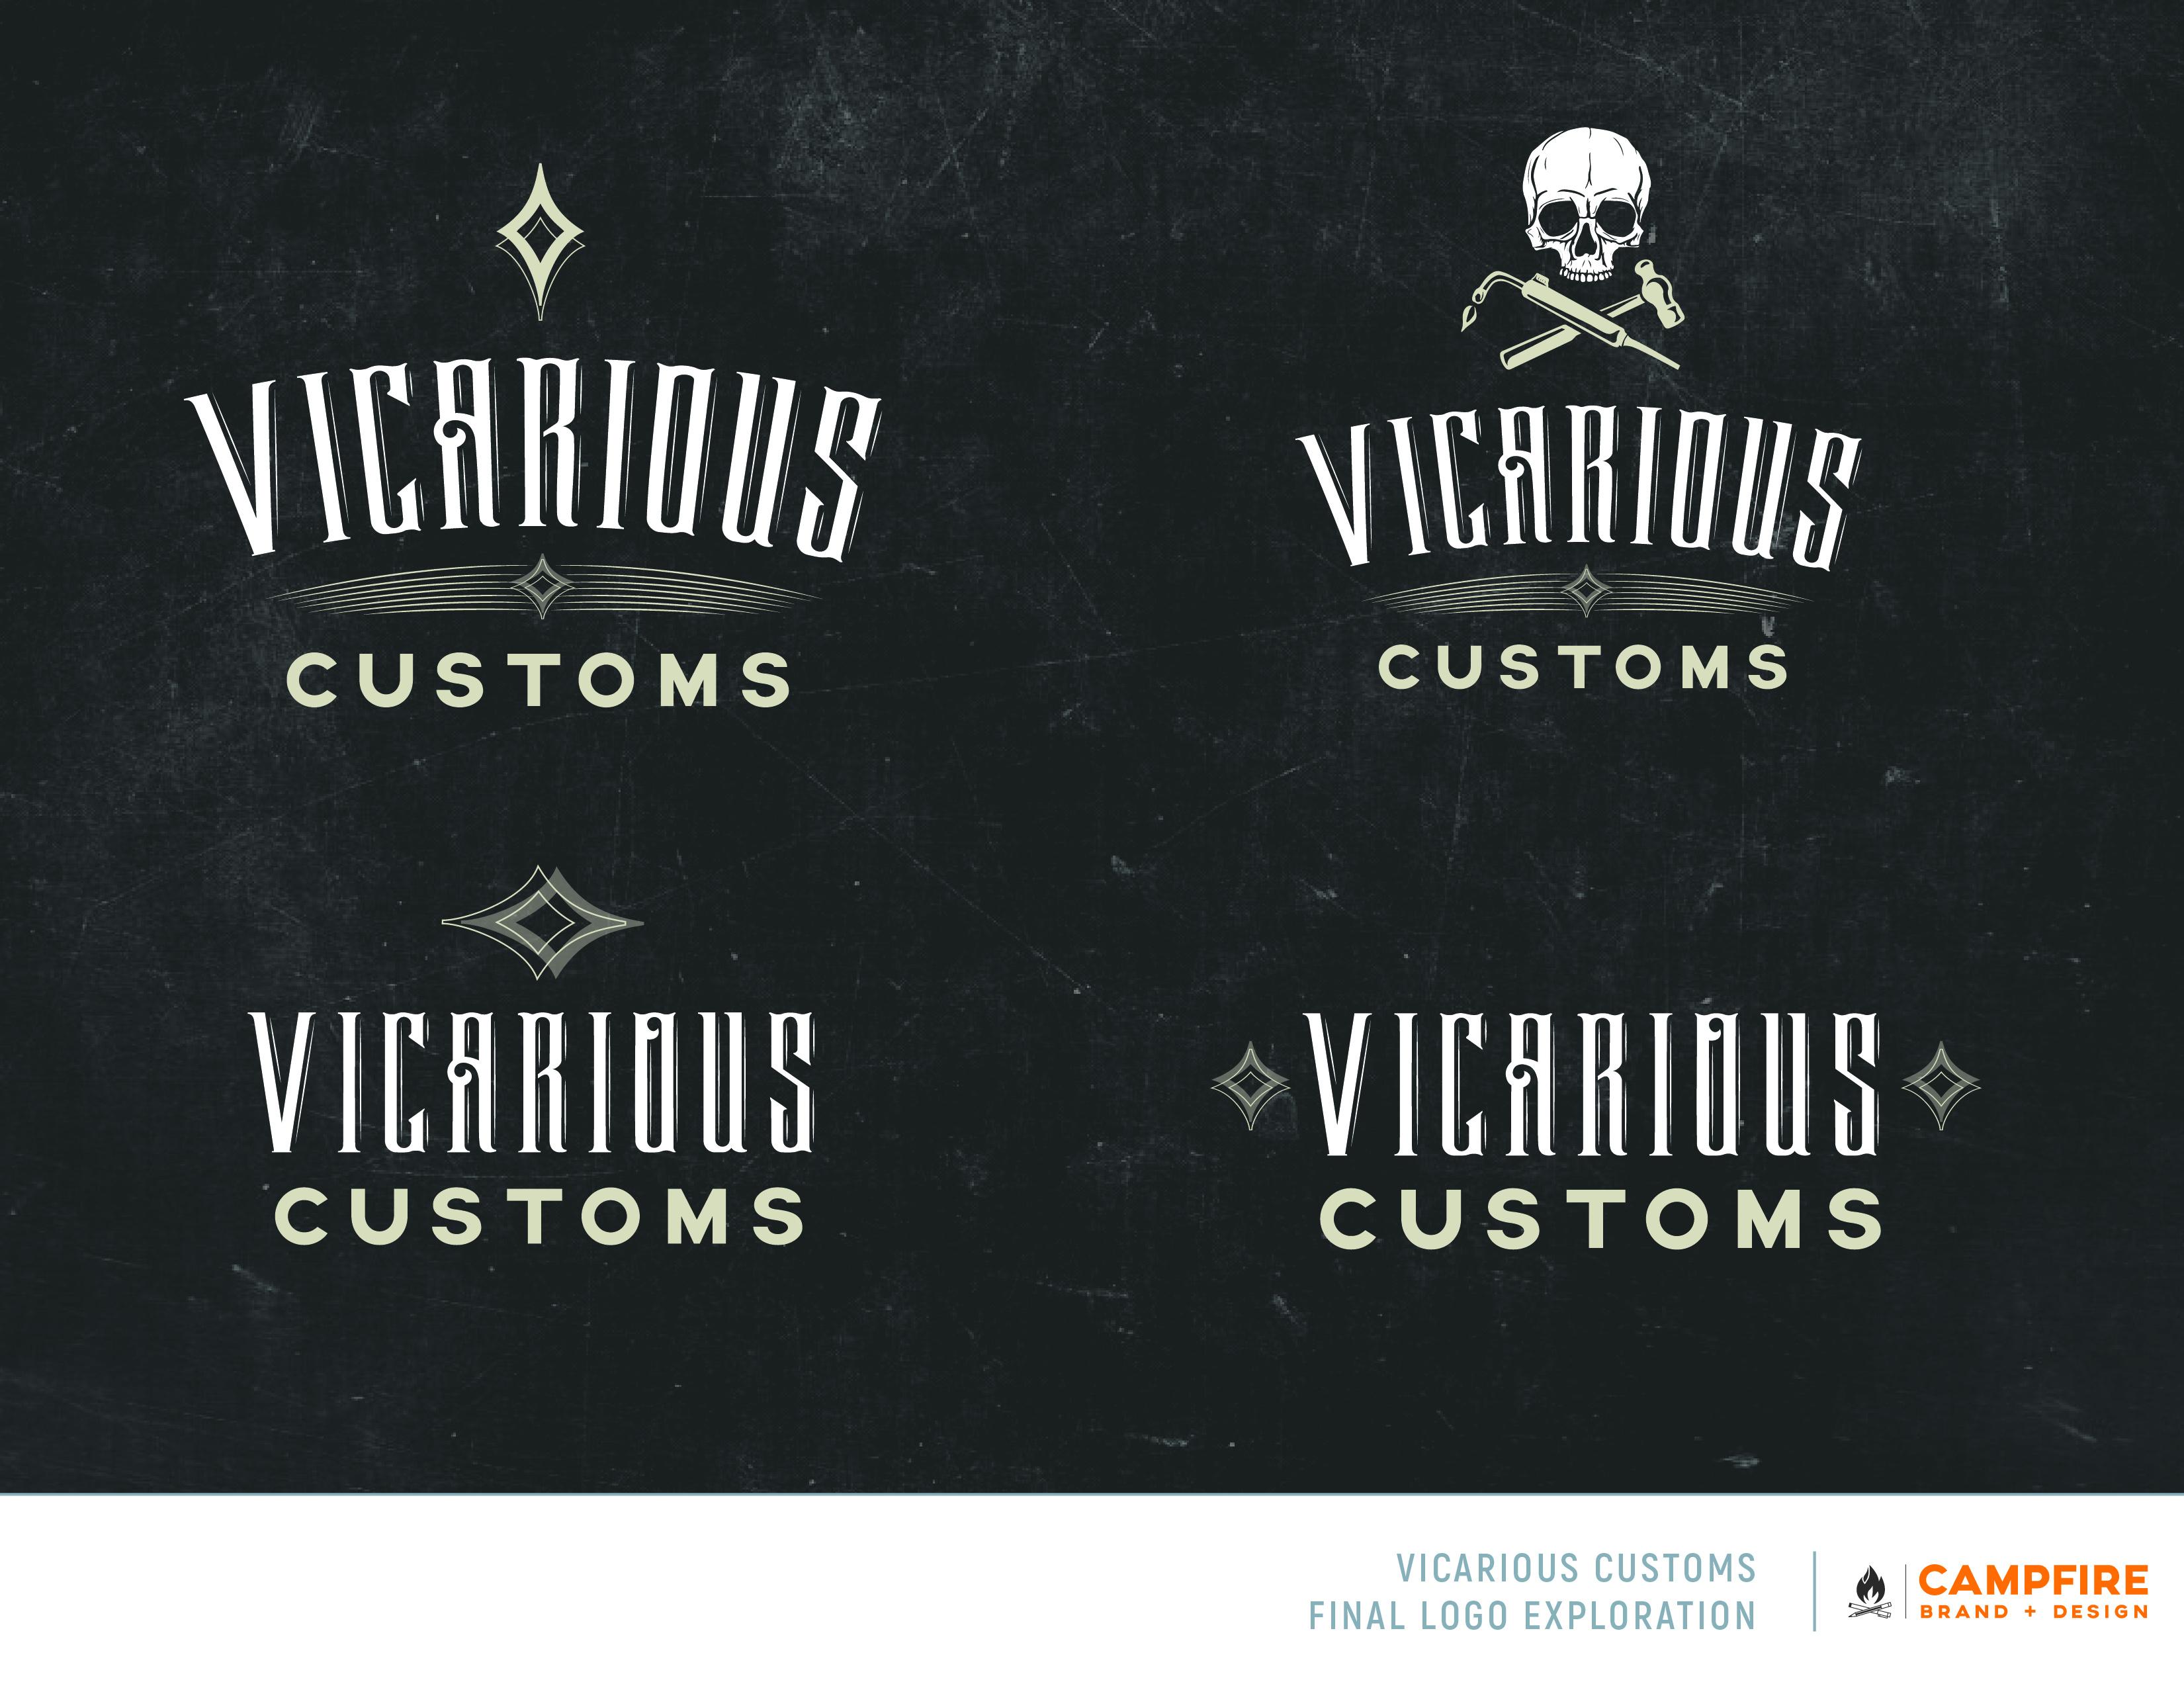 Vicarious Customs Brand Guide